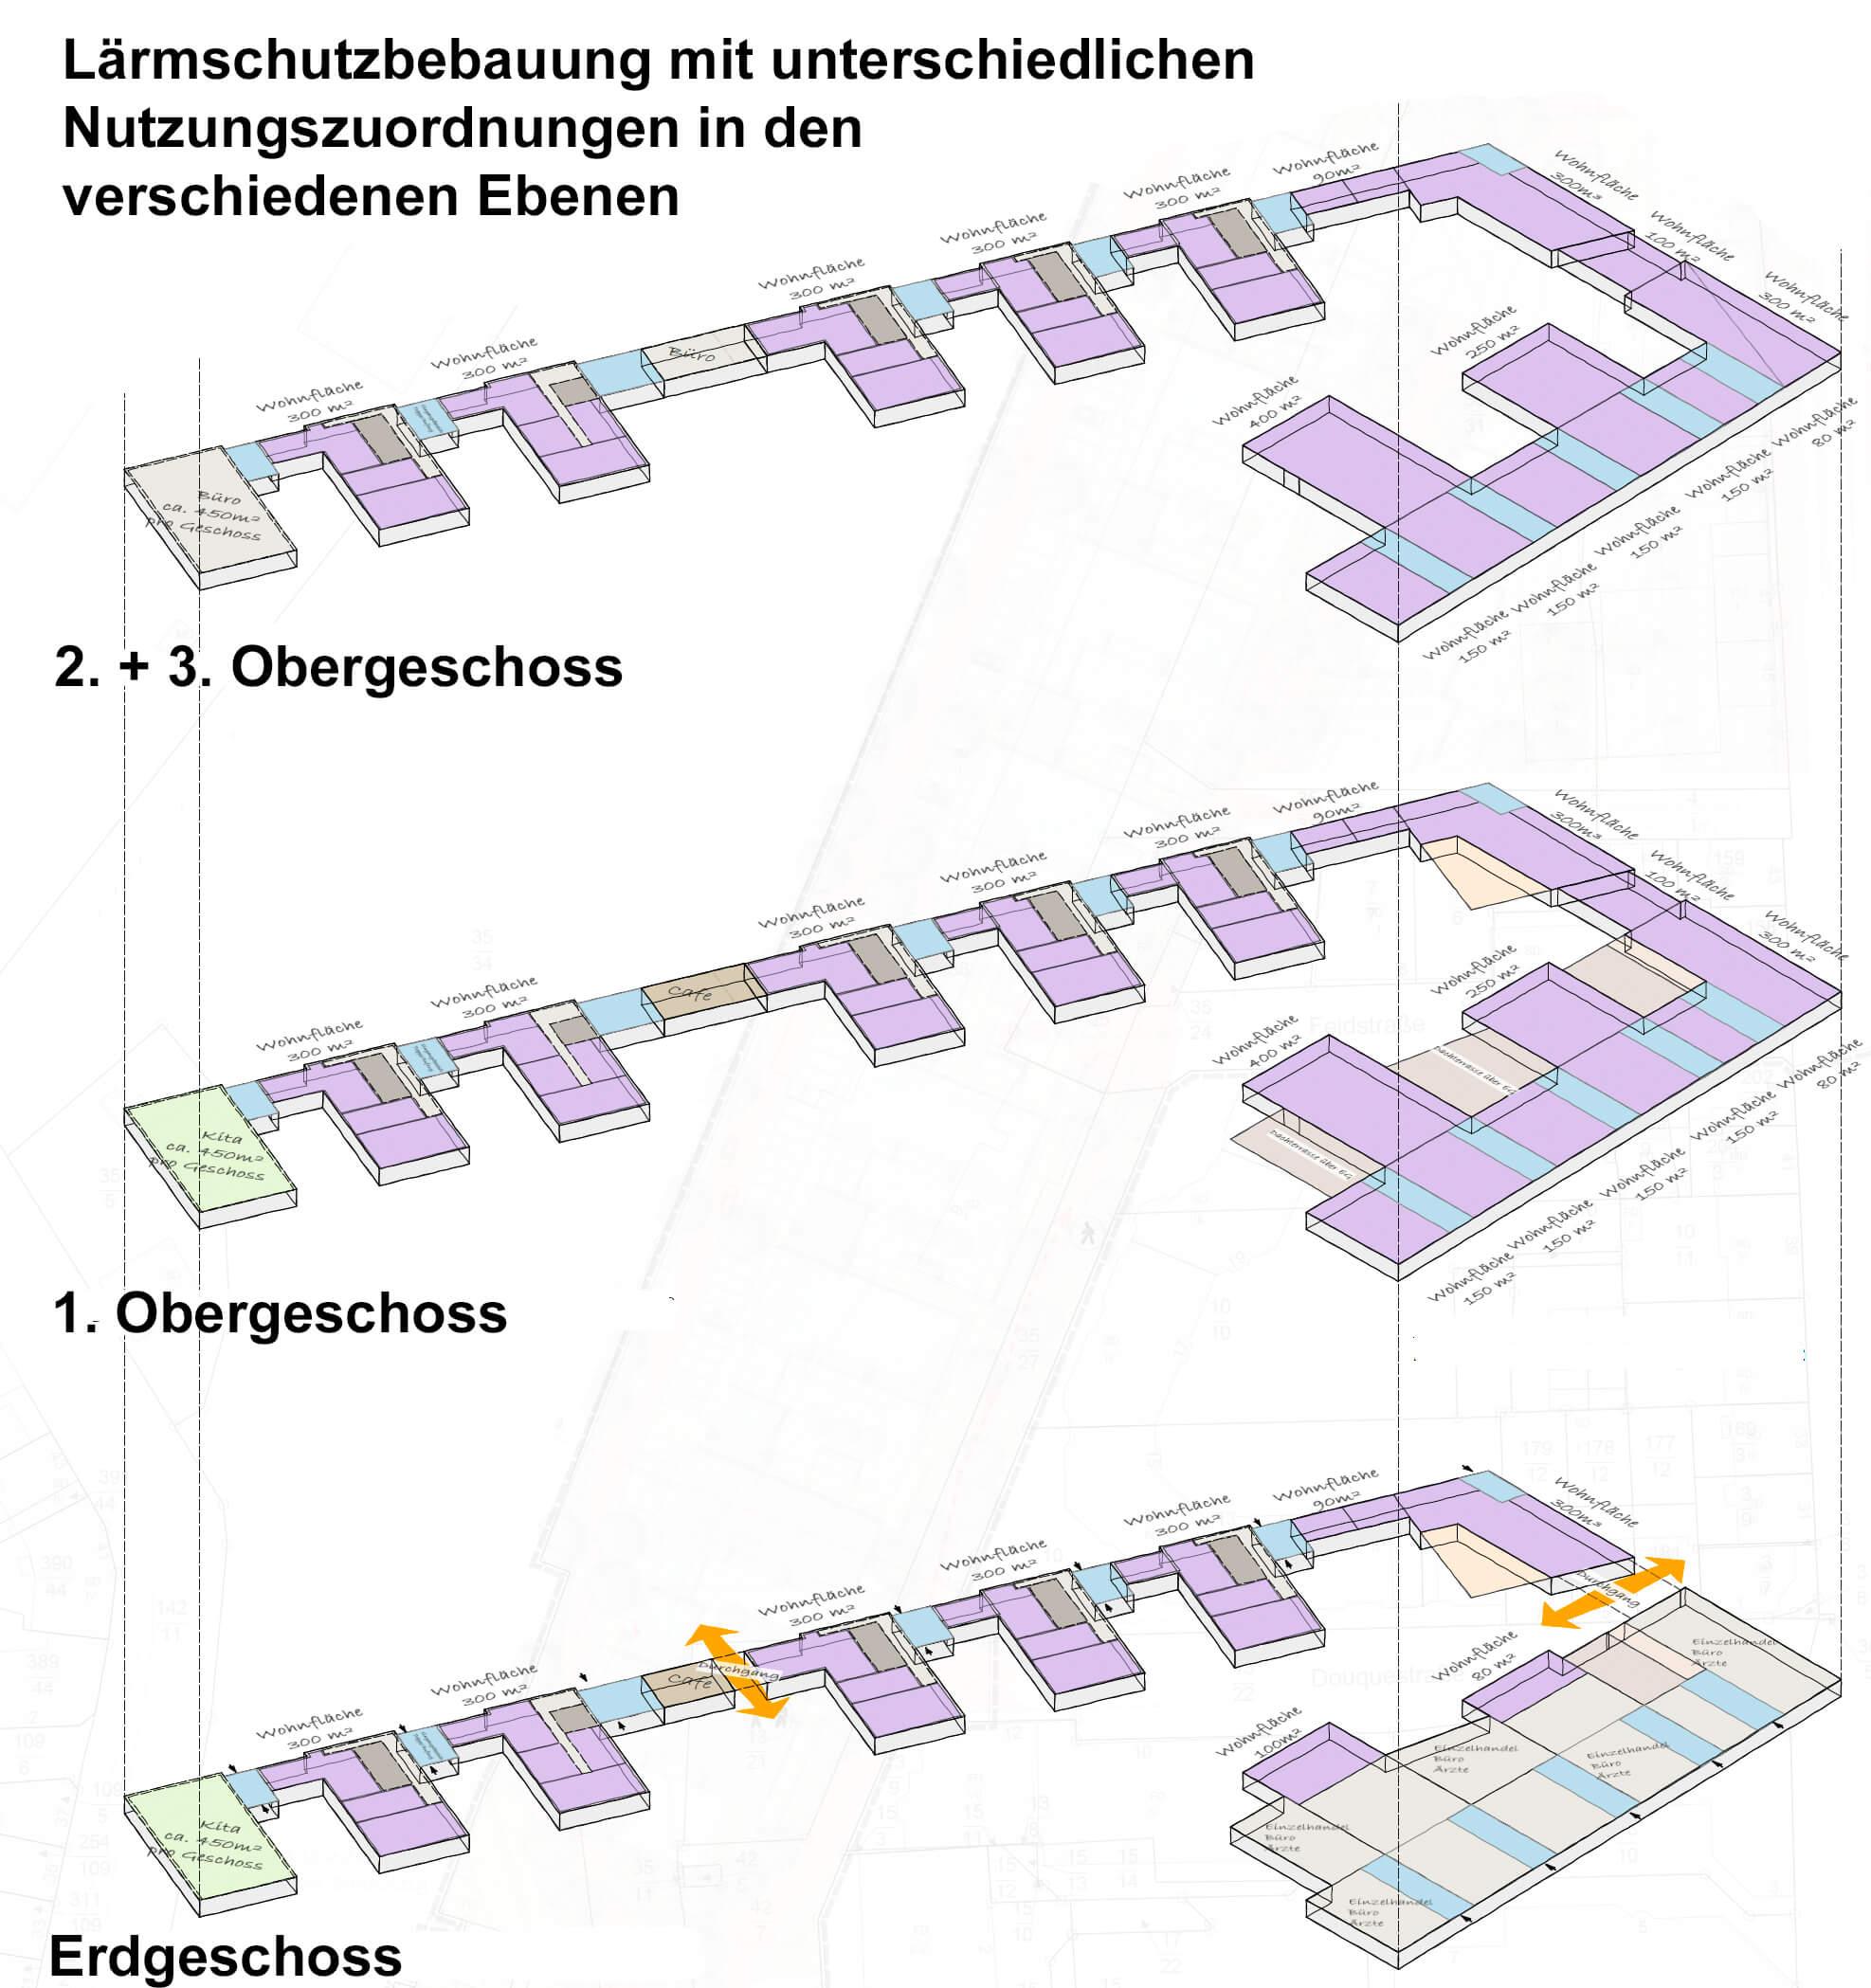 Urbanes-Gebiet-Fallbeispiel-Bebauungsplan-Planungsburo-ISU